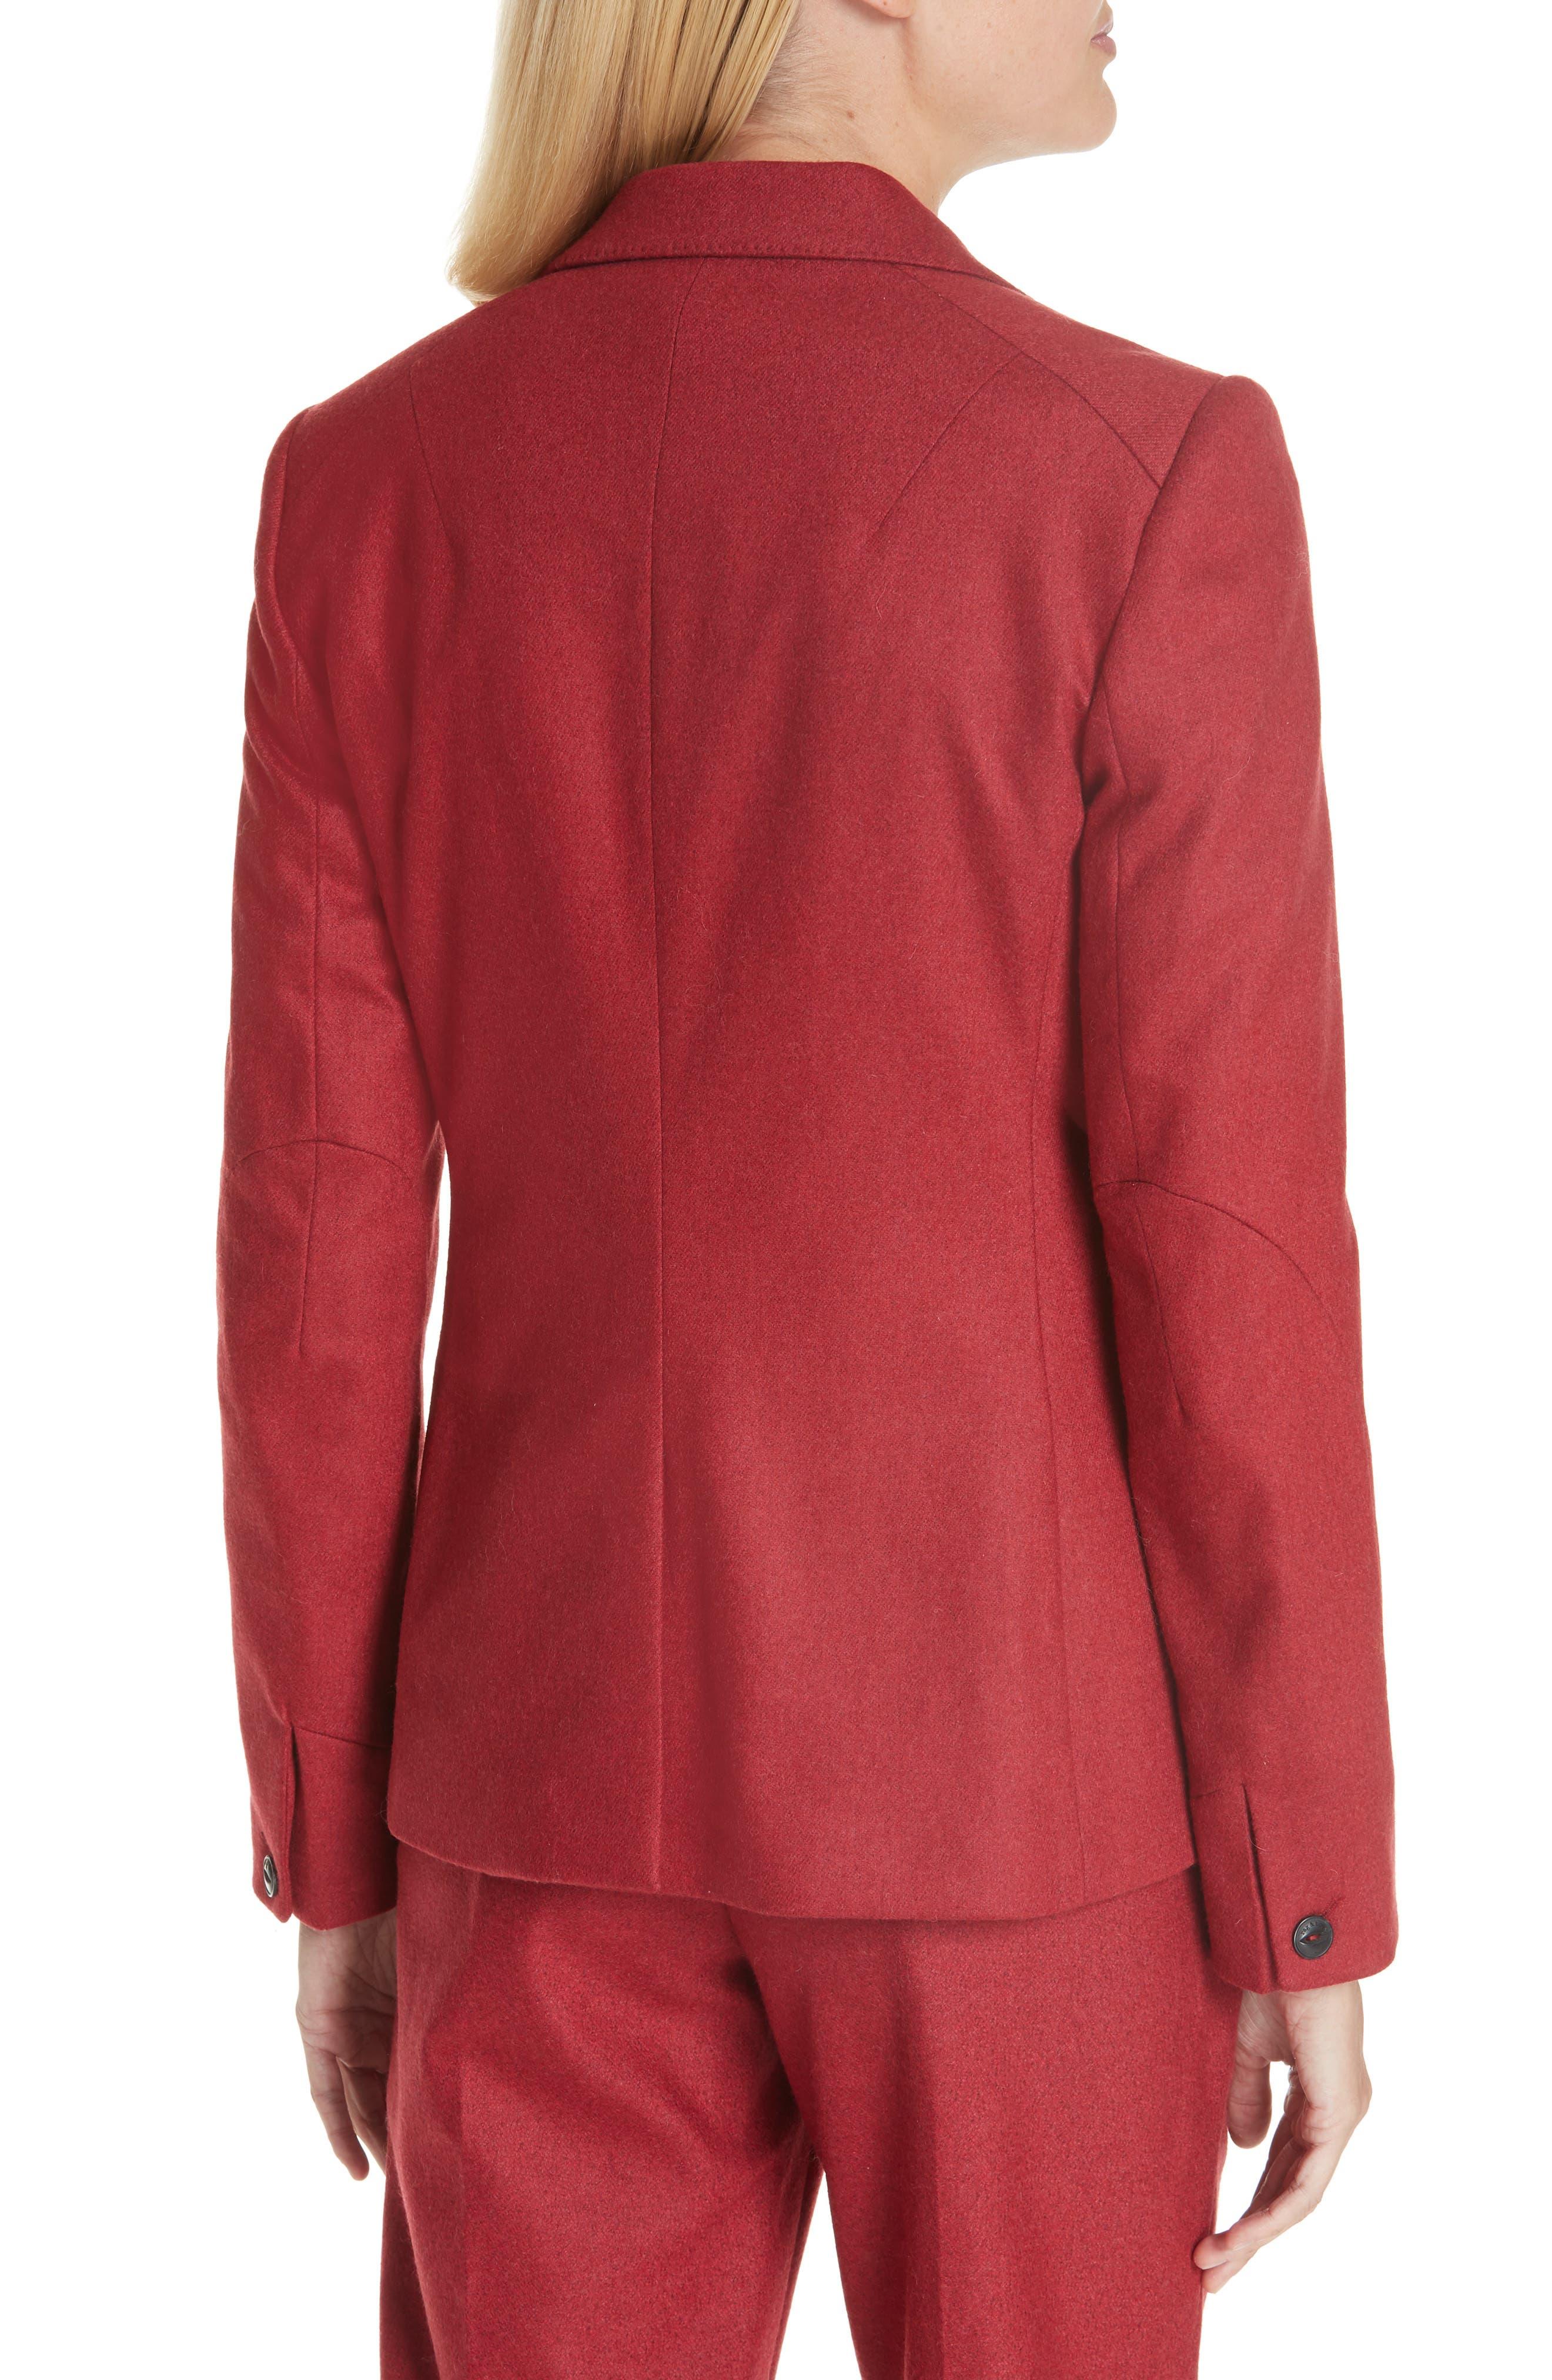 Lexington Wool Blend Blazer,                         Main,                         color, RED MELANGE